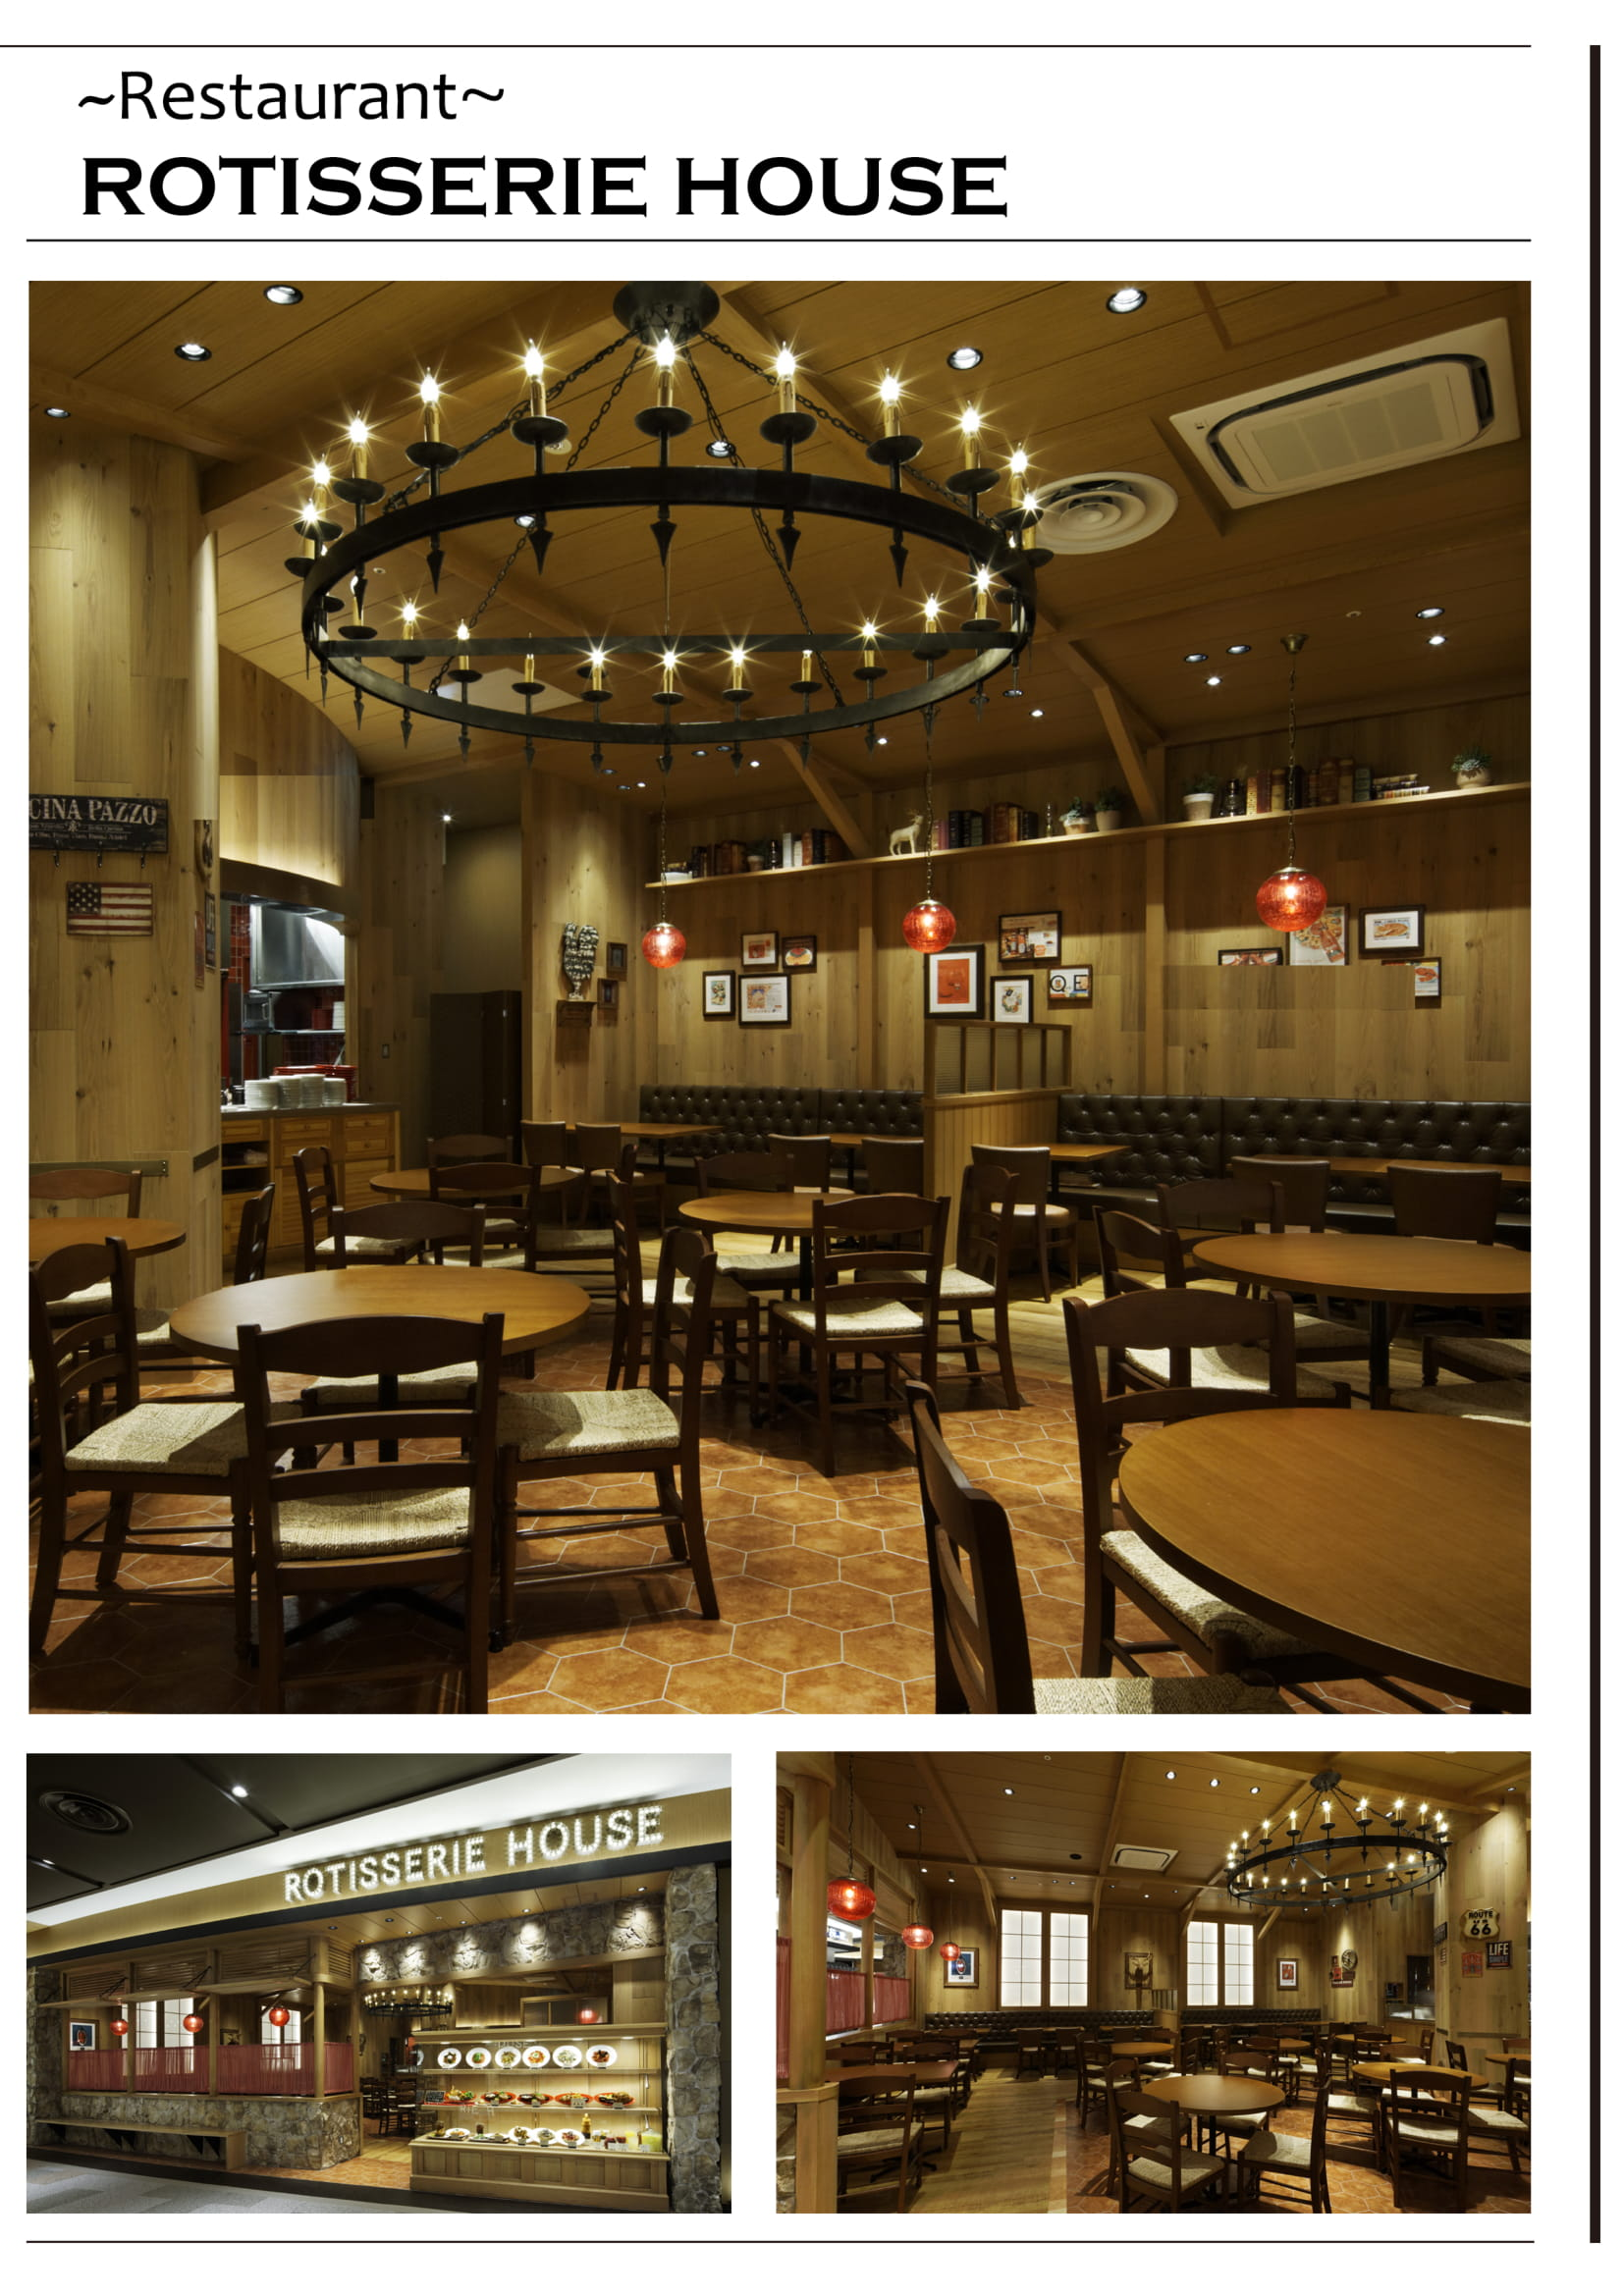 vintage house ヴィンテージハウス 内装 デザイン 店舗 商店建築 bamboomedia  ロサリティーハウス